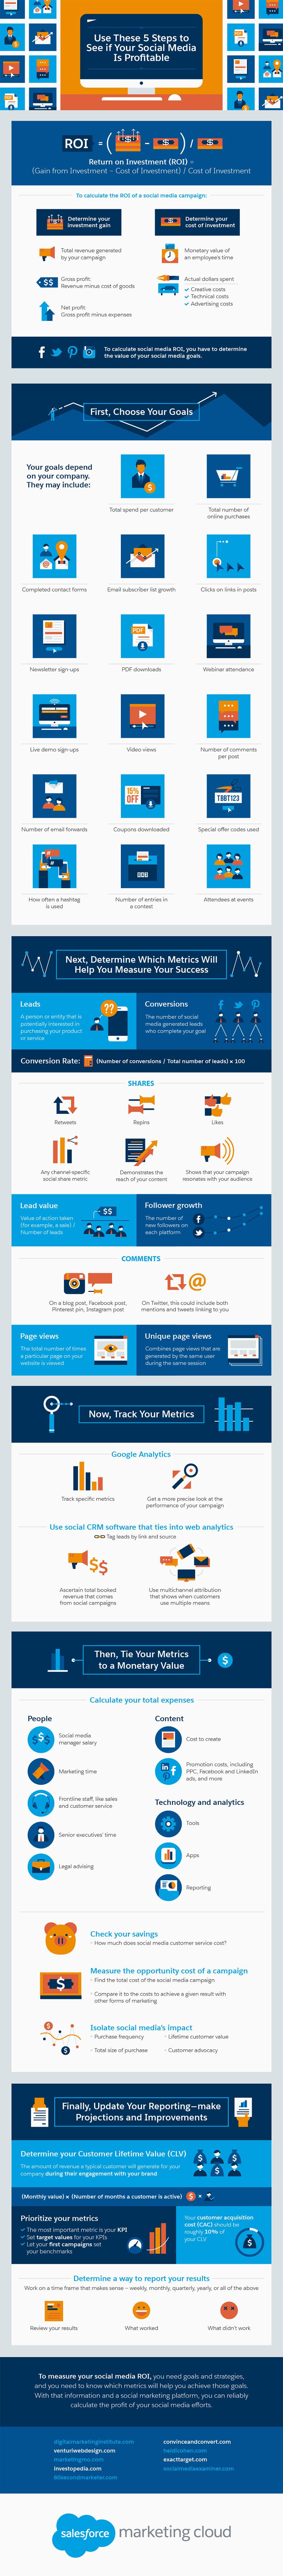 5 Steps To Check Your Social Media Profitability